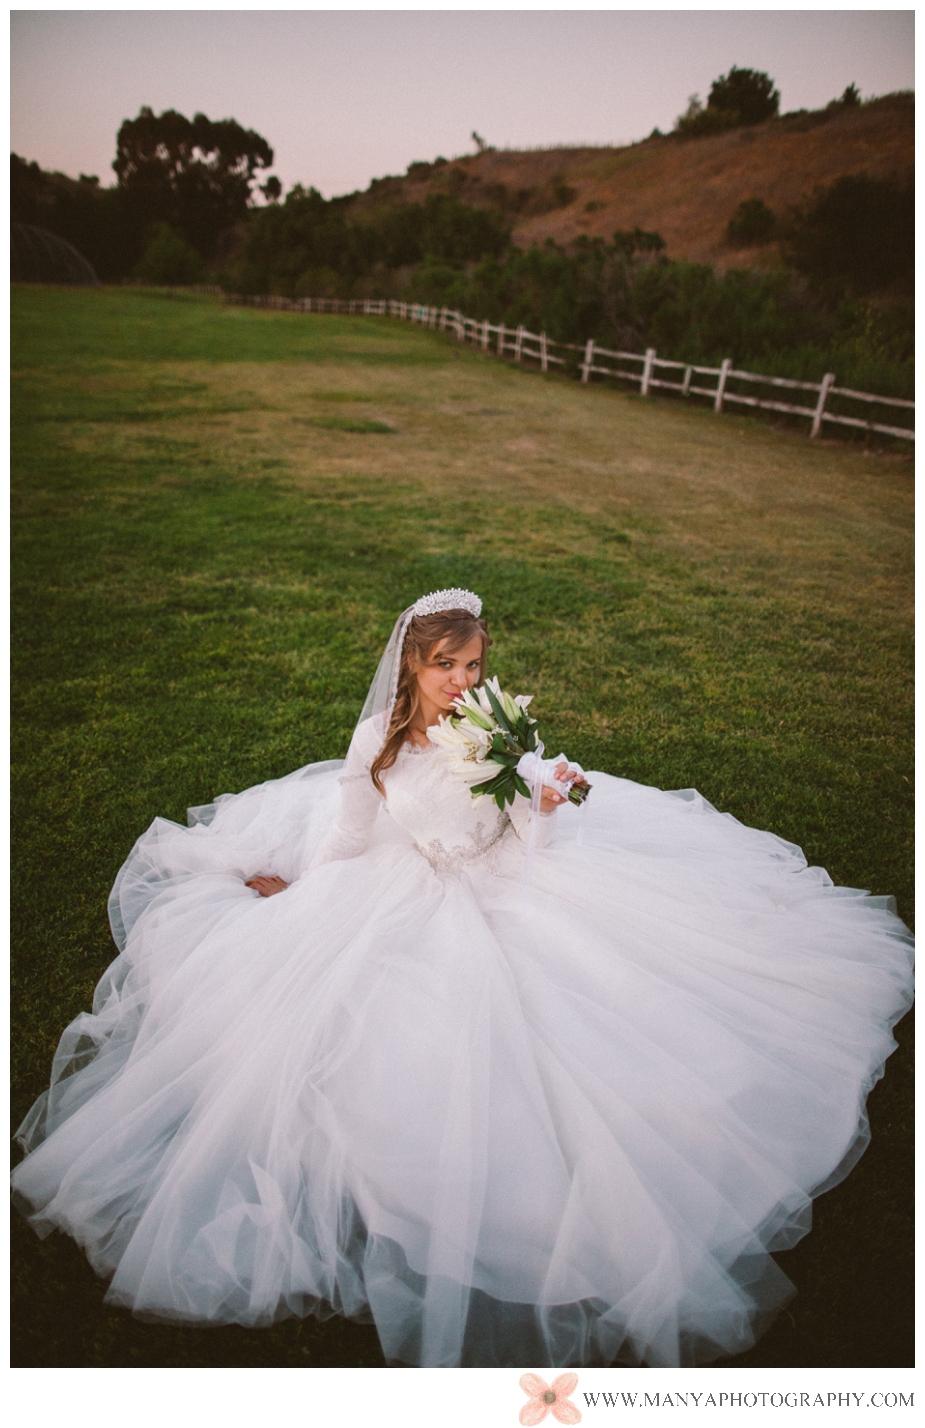 2013-07-23_0038 - Orange County Wedding Photography